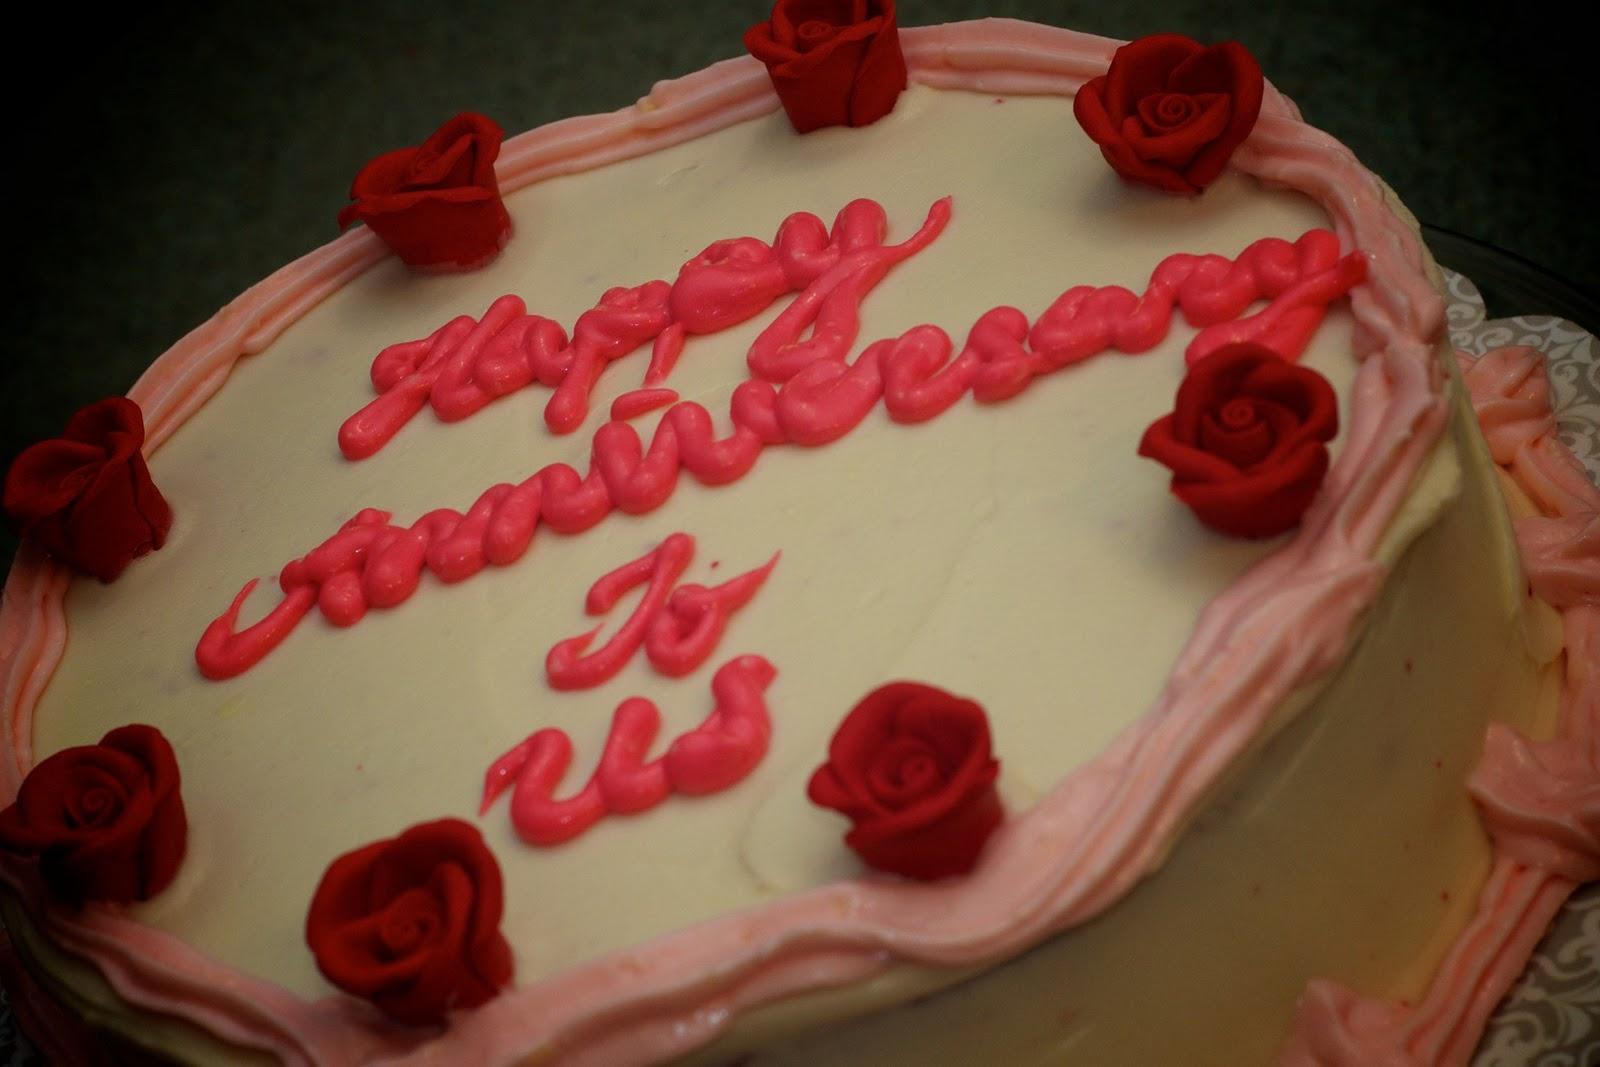 5th wedding anniversary cake designs u2013 ali wolf style wedding